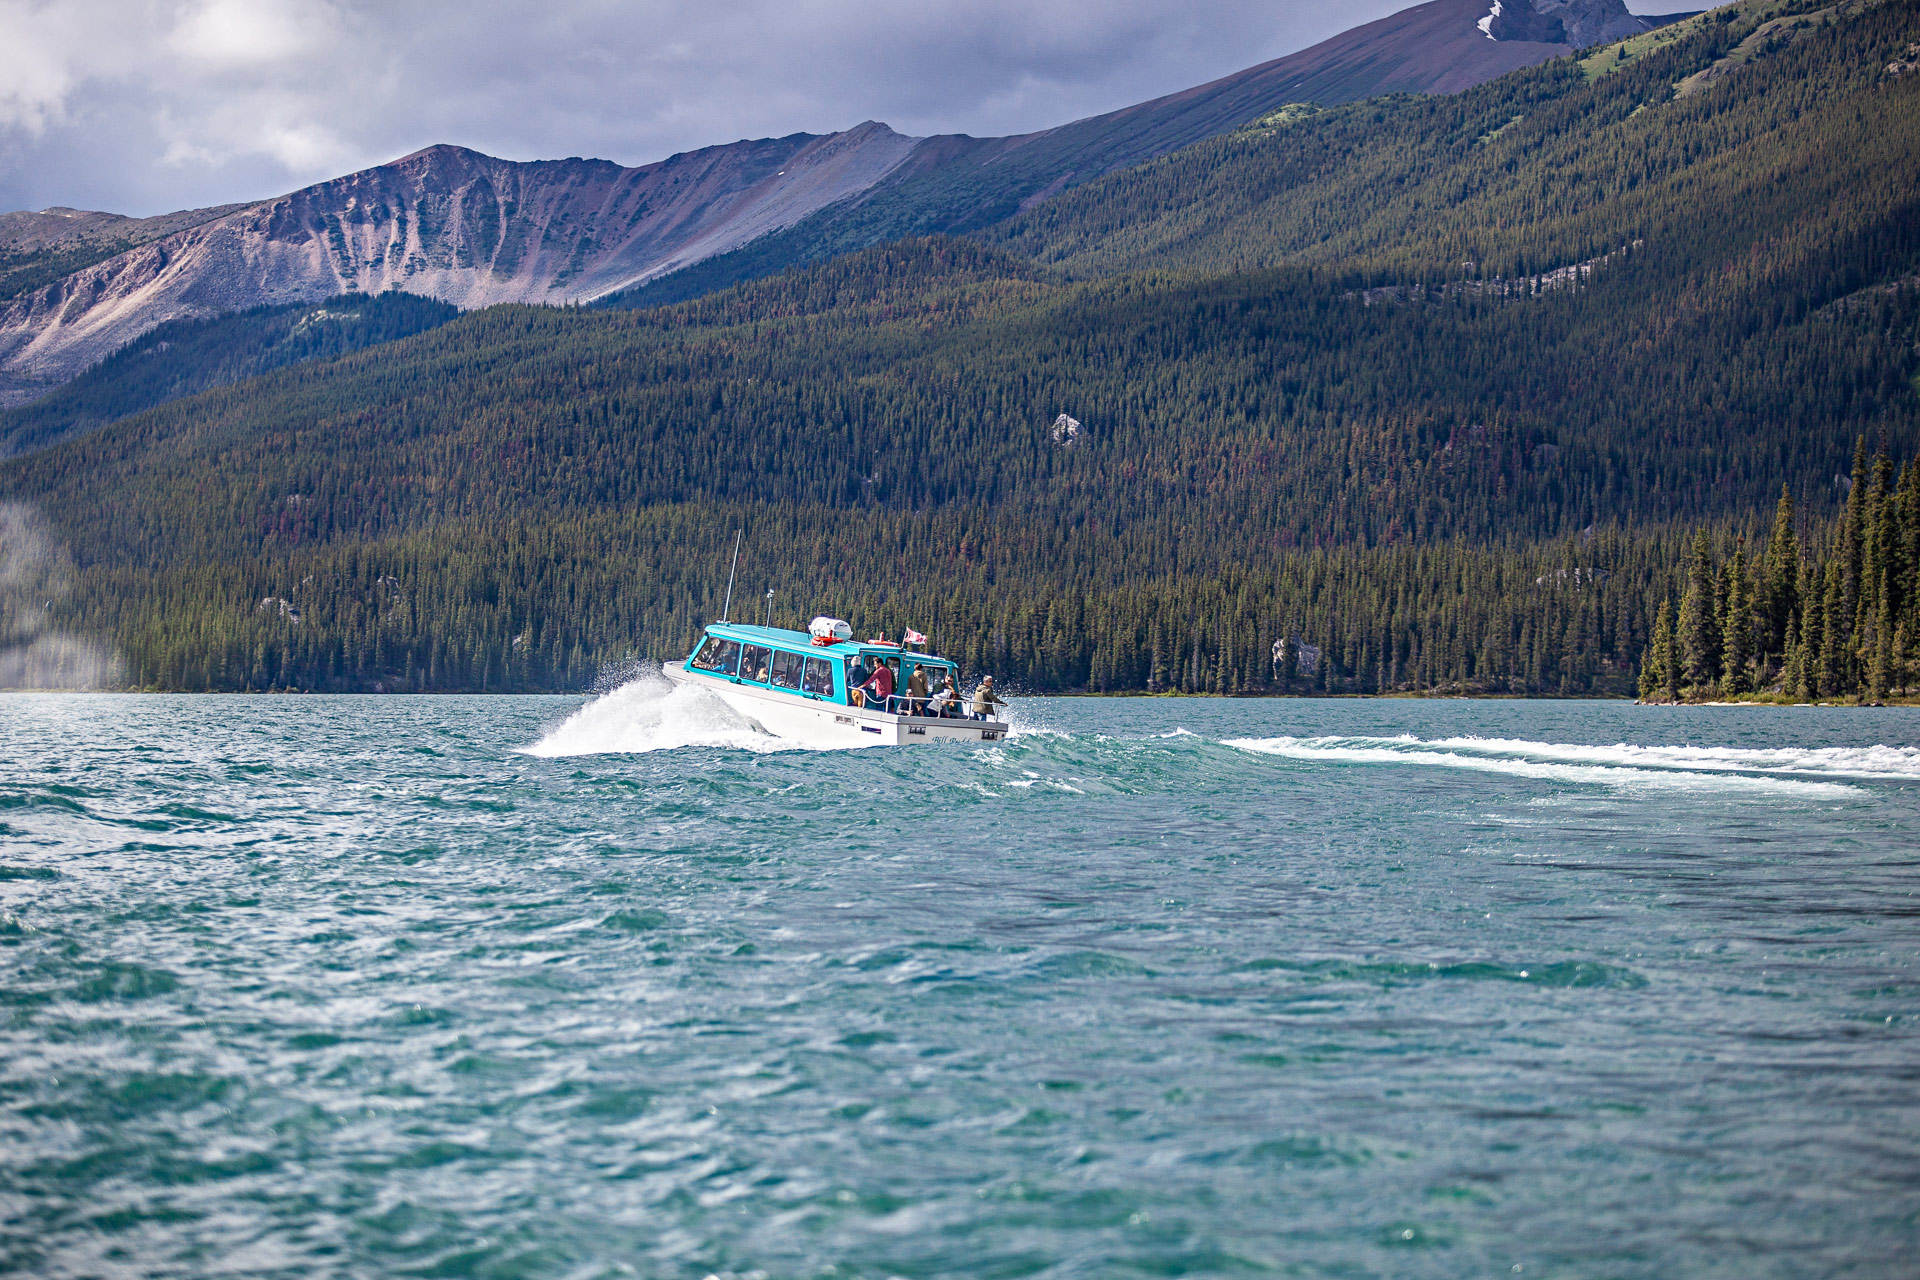 Bateau Maligne Lake Tour Jasper Canada